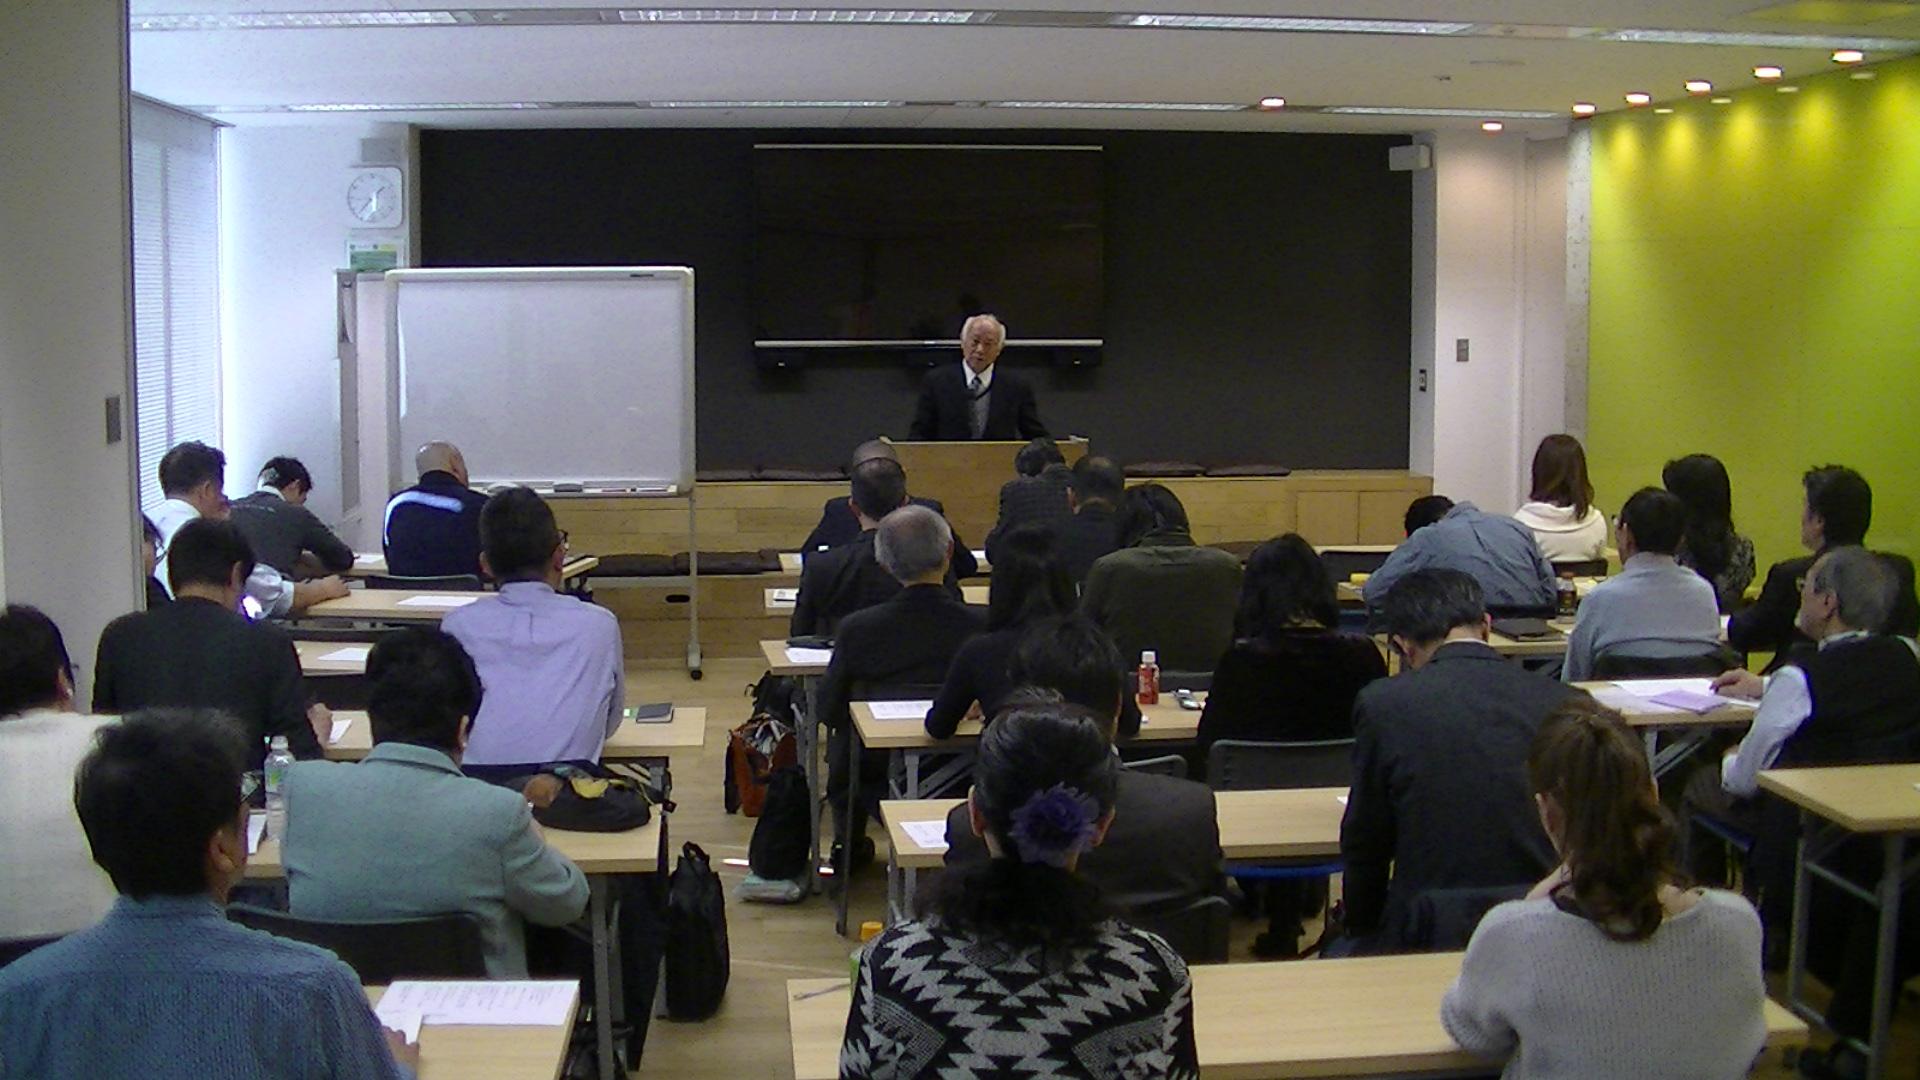 PIC 0697 - 4月1日東京思風塾の開催になります。